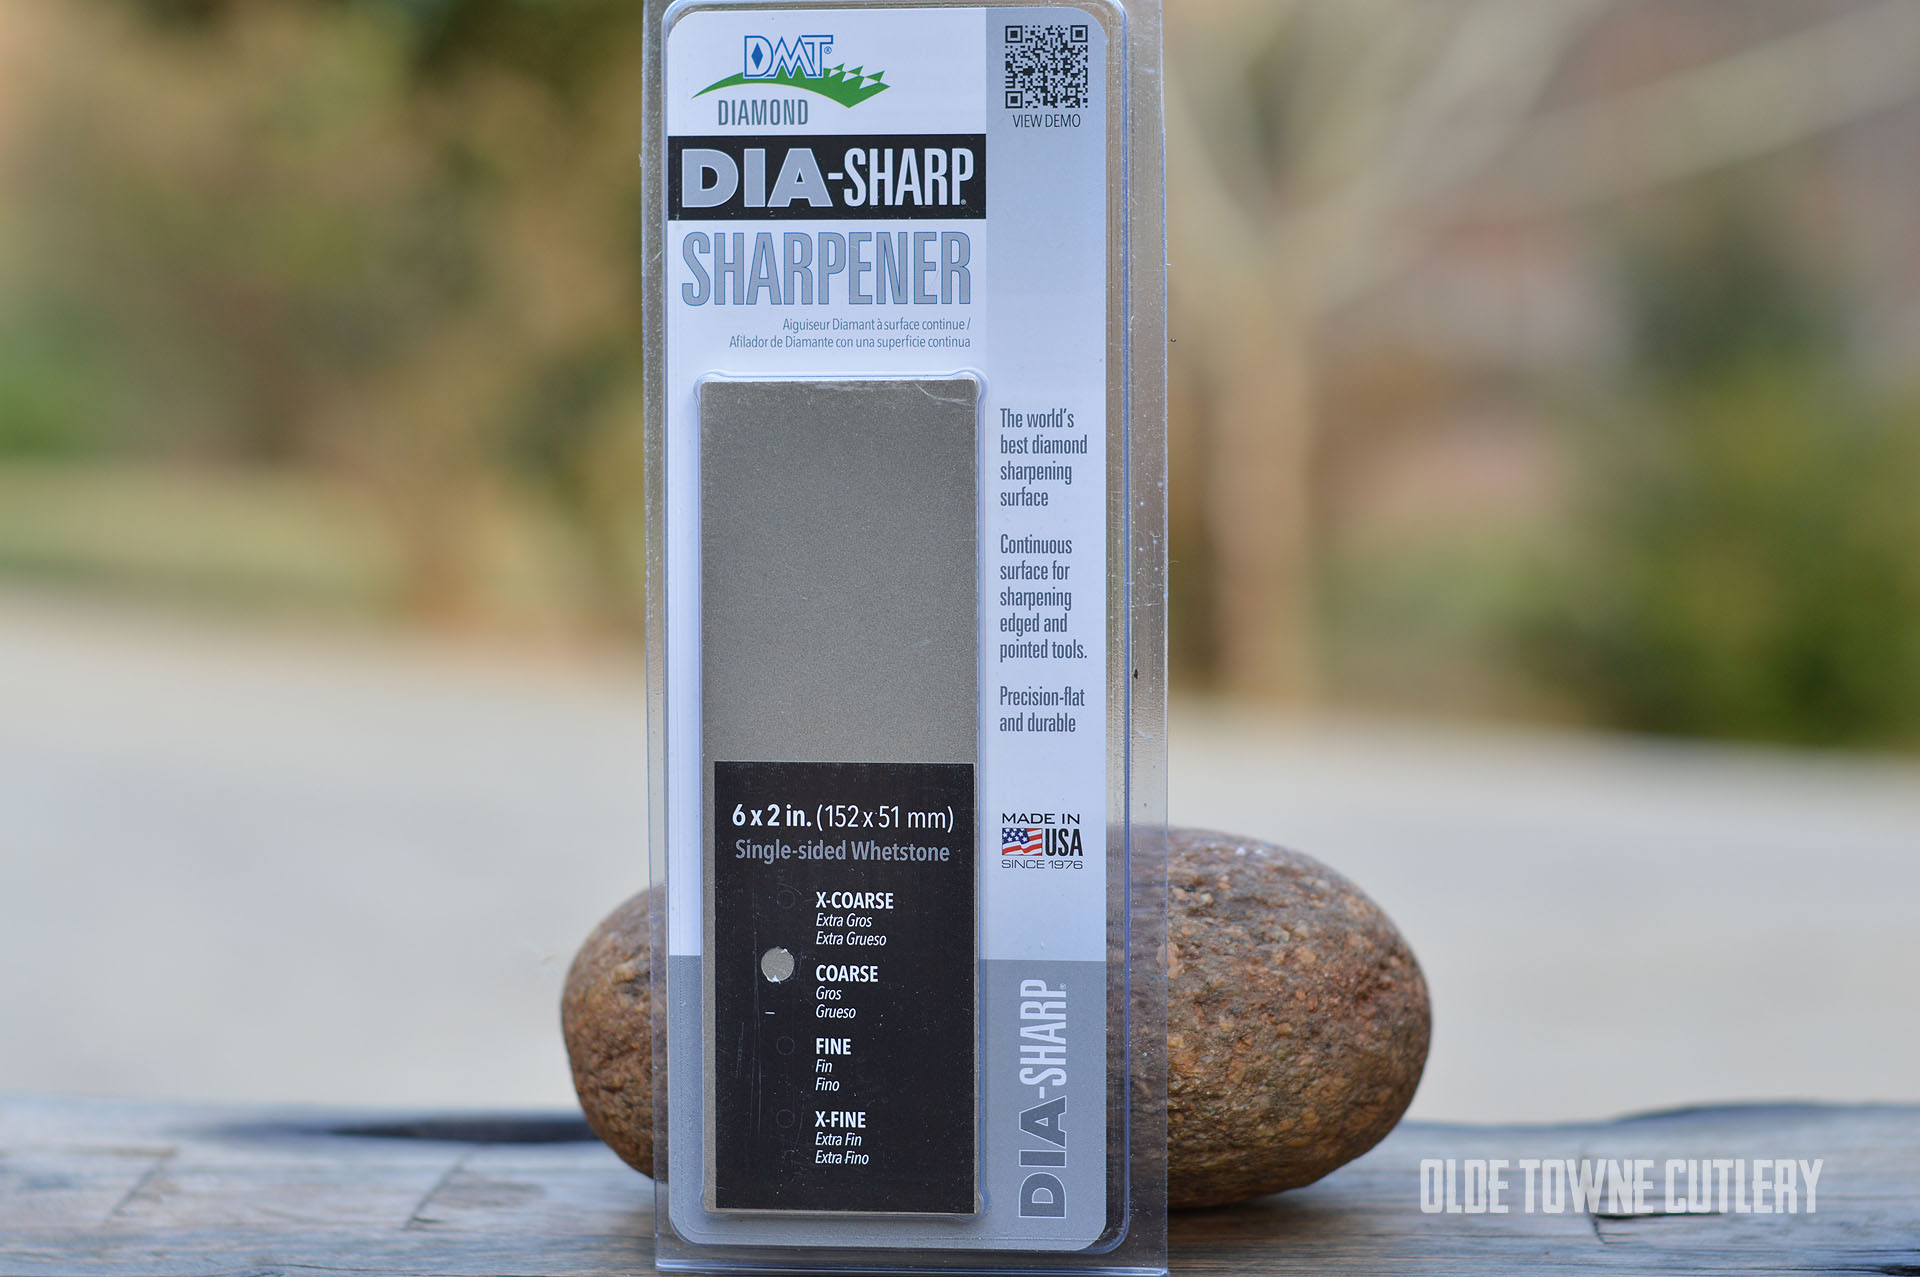 DMT D6C Diamond DIA-Sharp Sharpener Coarse